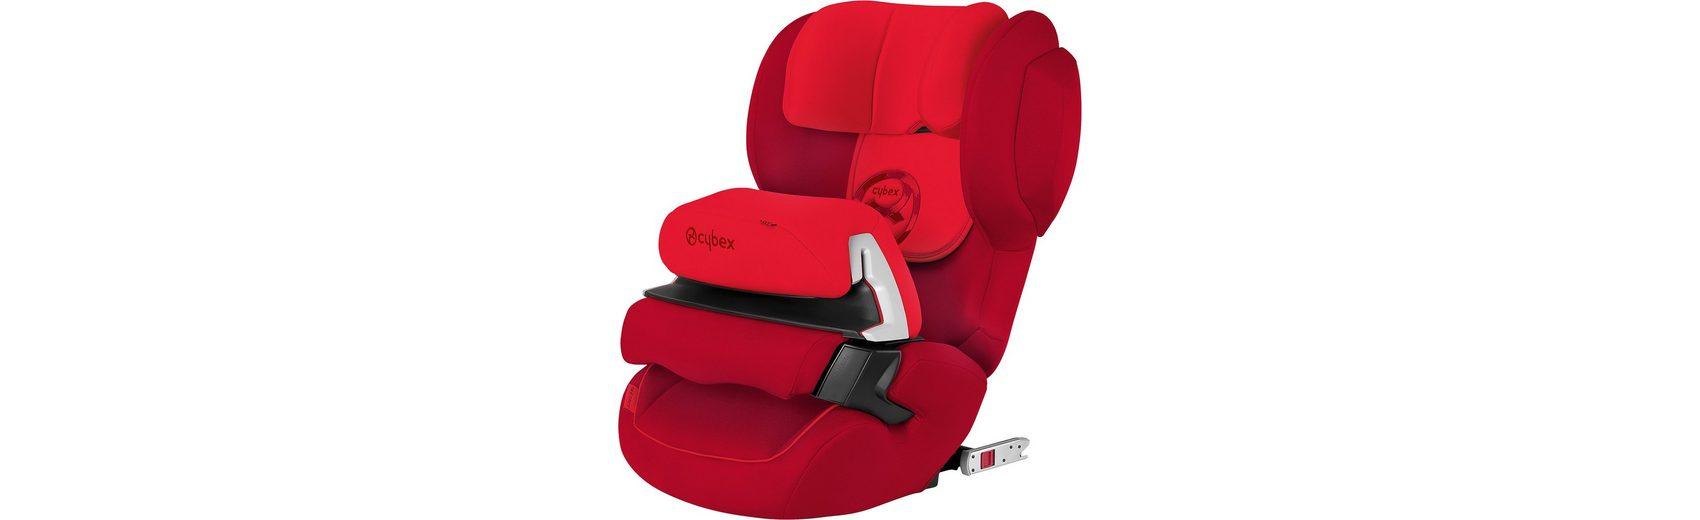 Cybex Auto-Kindersitz Juno 2-Fix, Gold-Line, Mars Red-Red, 2016